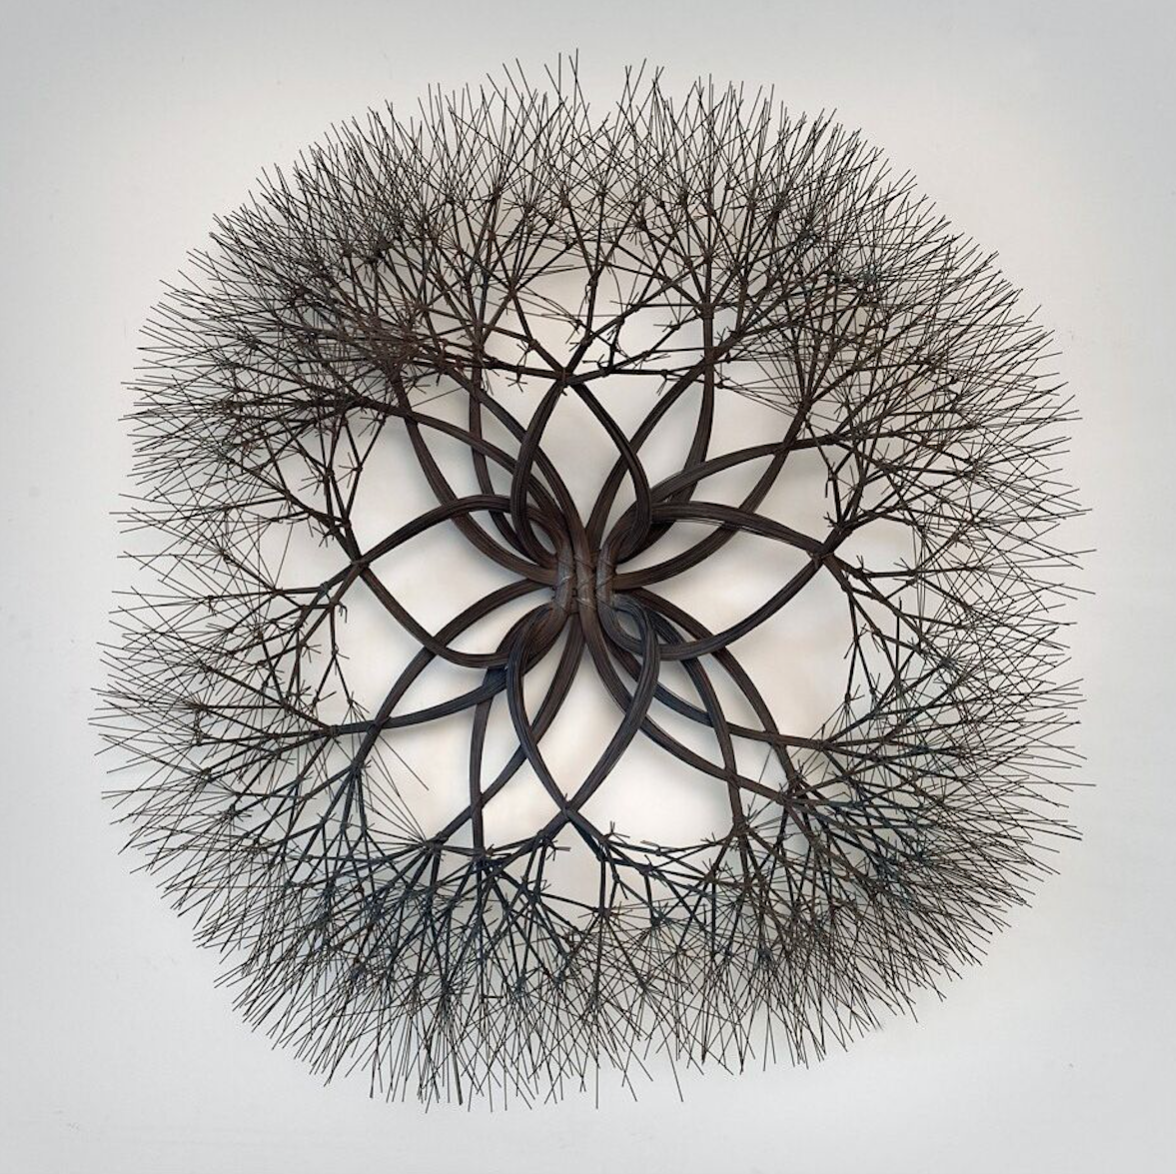 Ruth Asawa,  Untitled , 1965-1970. Courtesy of Crystal Bridges Museum of American Art, Bentonville, Arkansas.